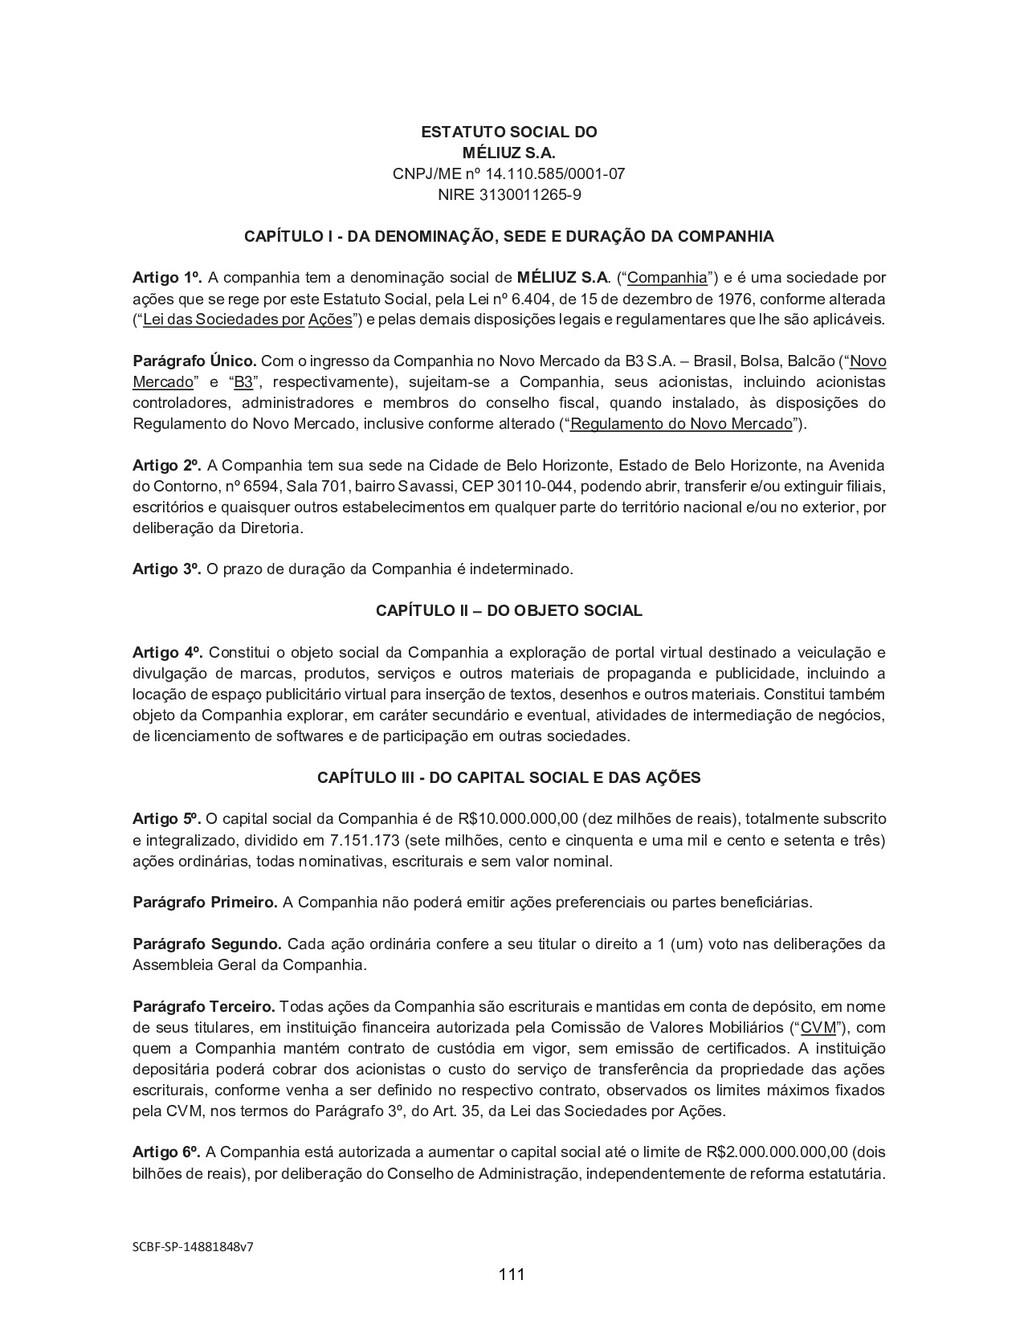 SCBF-SP-14881848v7 ESTATUTO SOCIAL DO MÉLIUZ S....